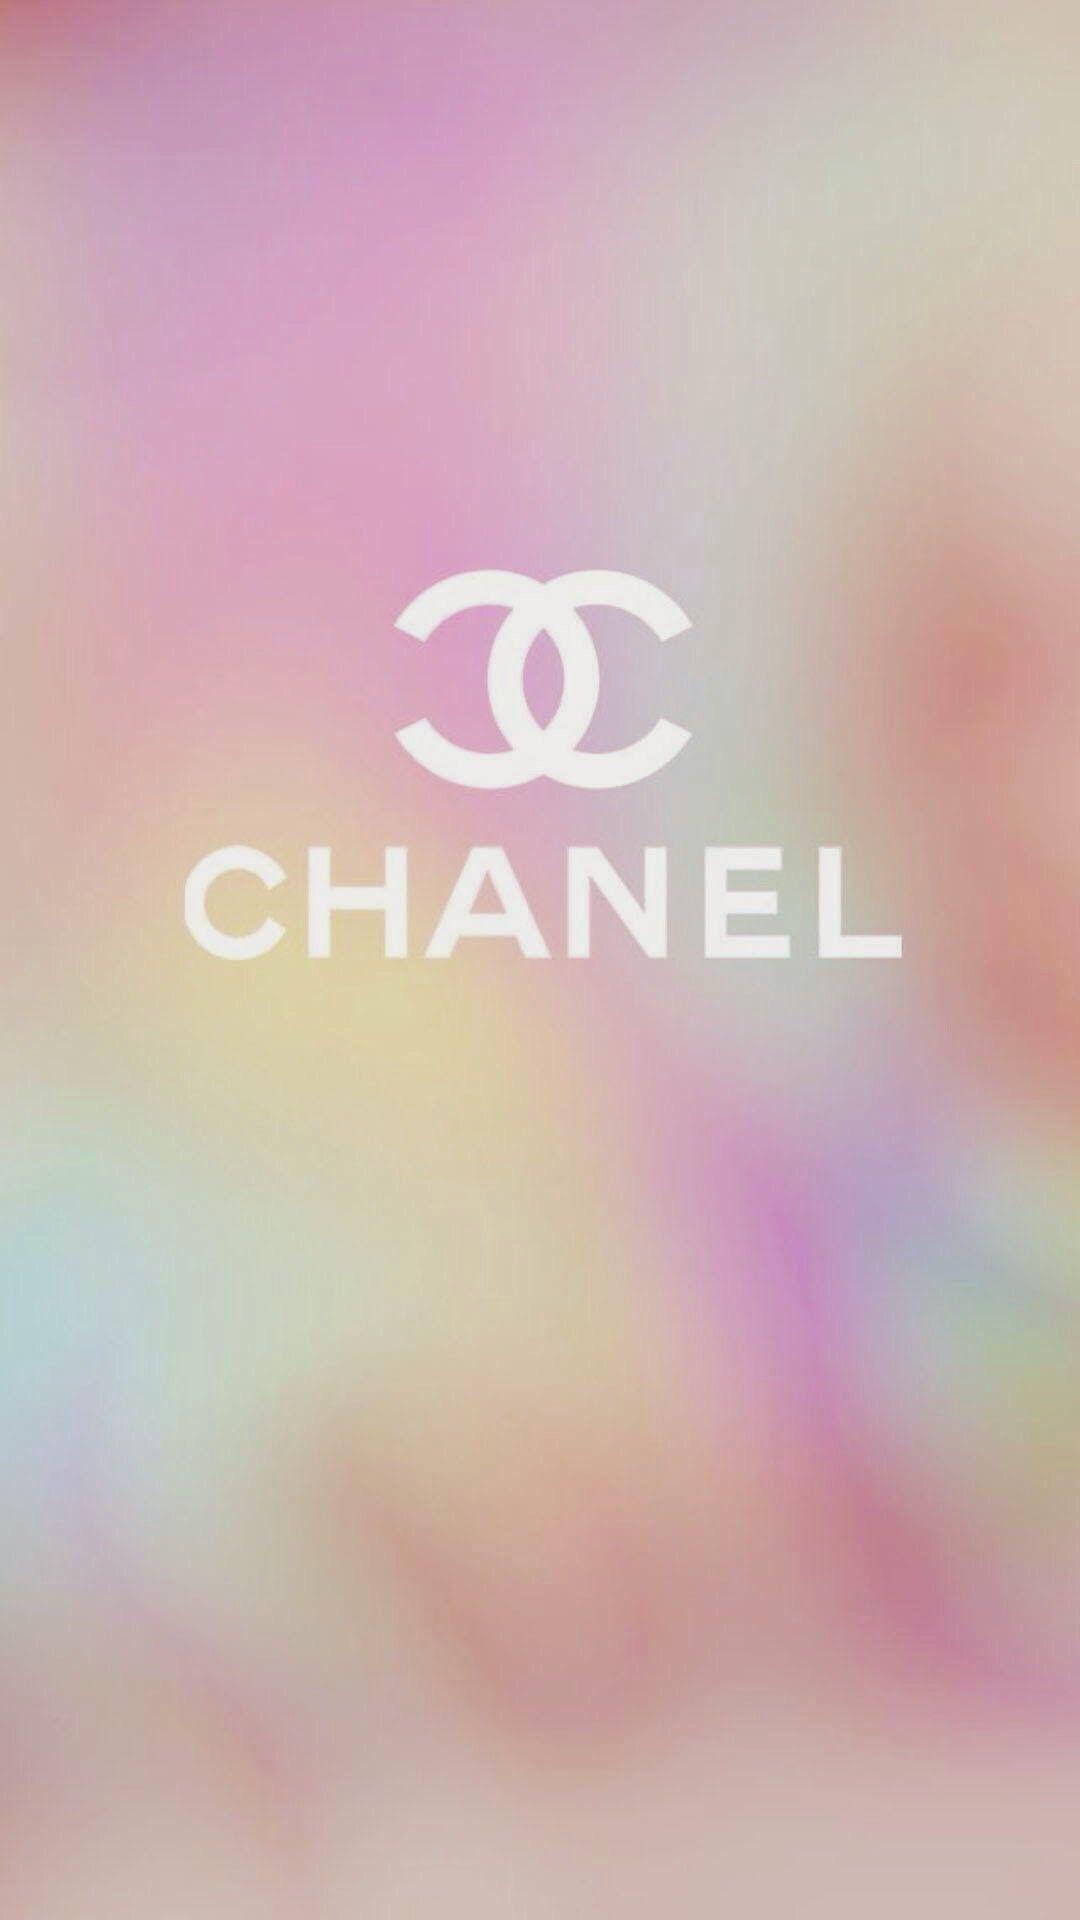 Chanelのiphone壁紙 Wallpaper 画像あり 壁紙 Iphone壁紙 シャネル